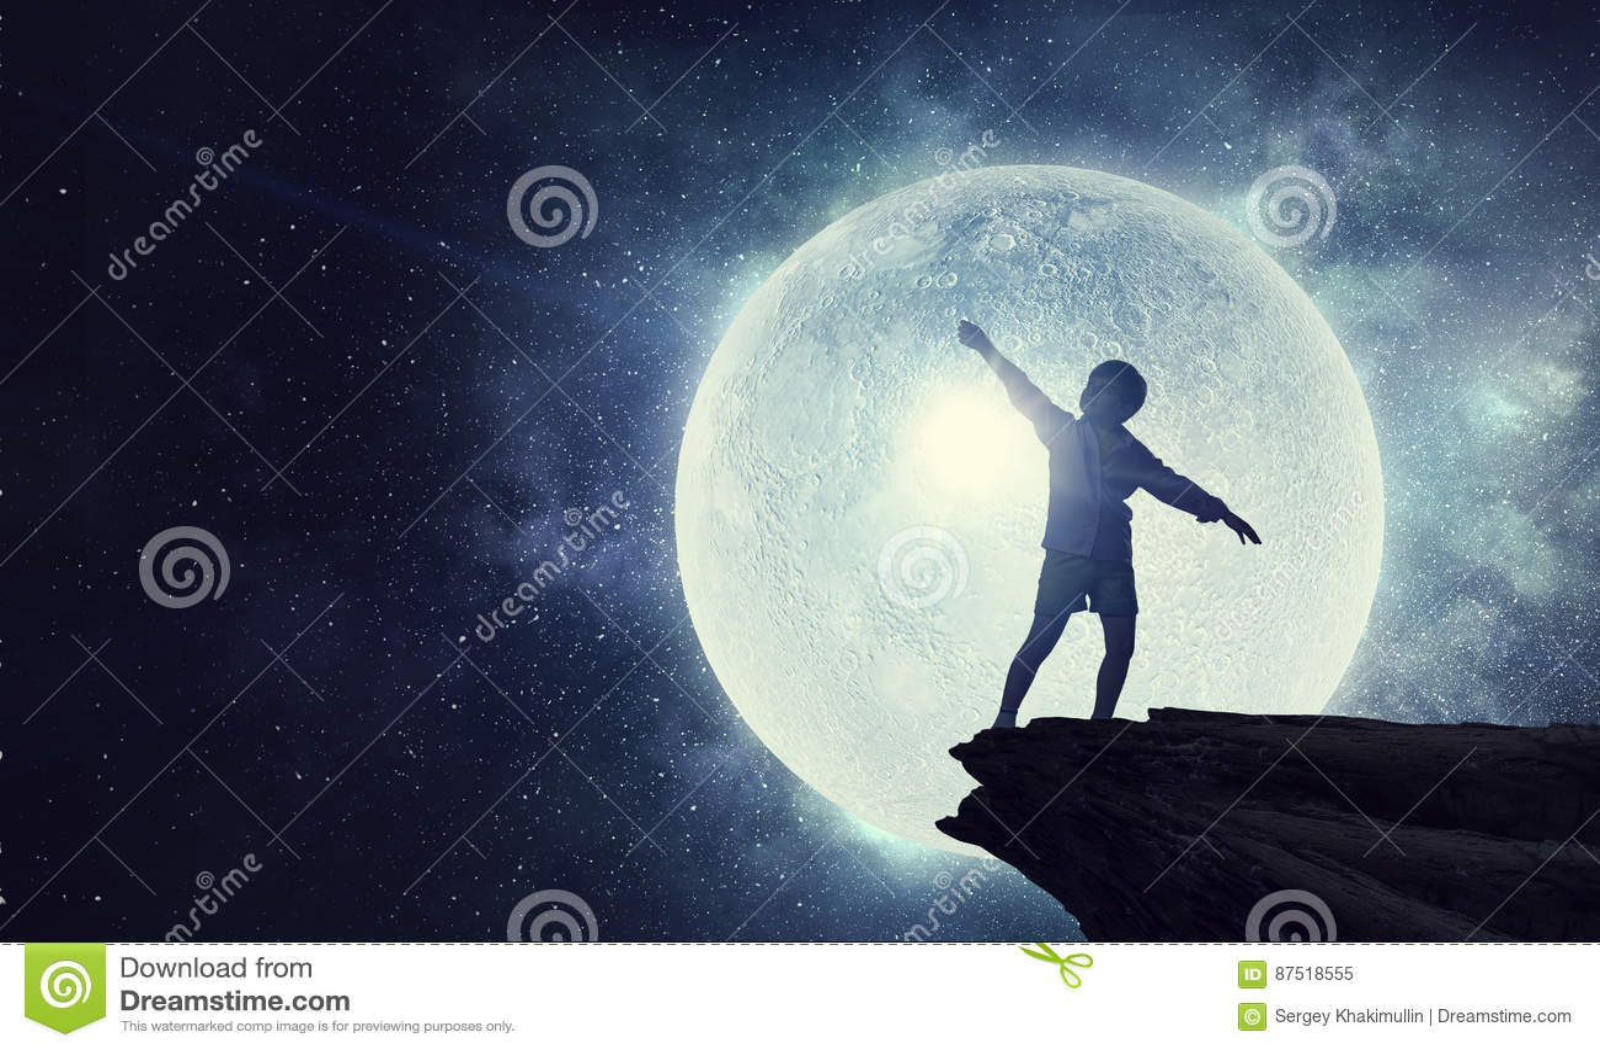 Kids at night with moon royalty free stock photography image - Royalty Free Stock Photo Boy Childish Kid Moon Night